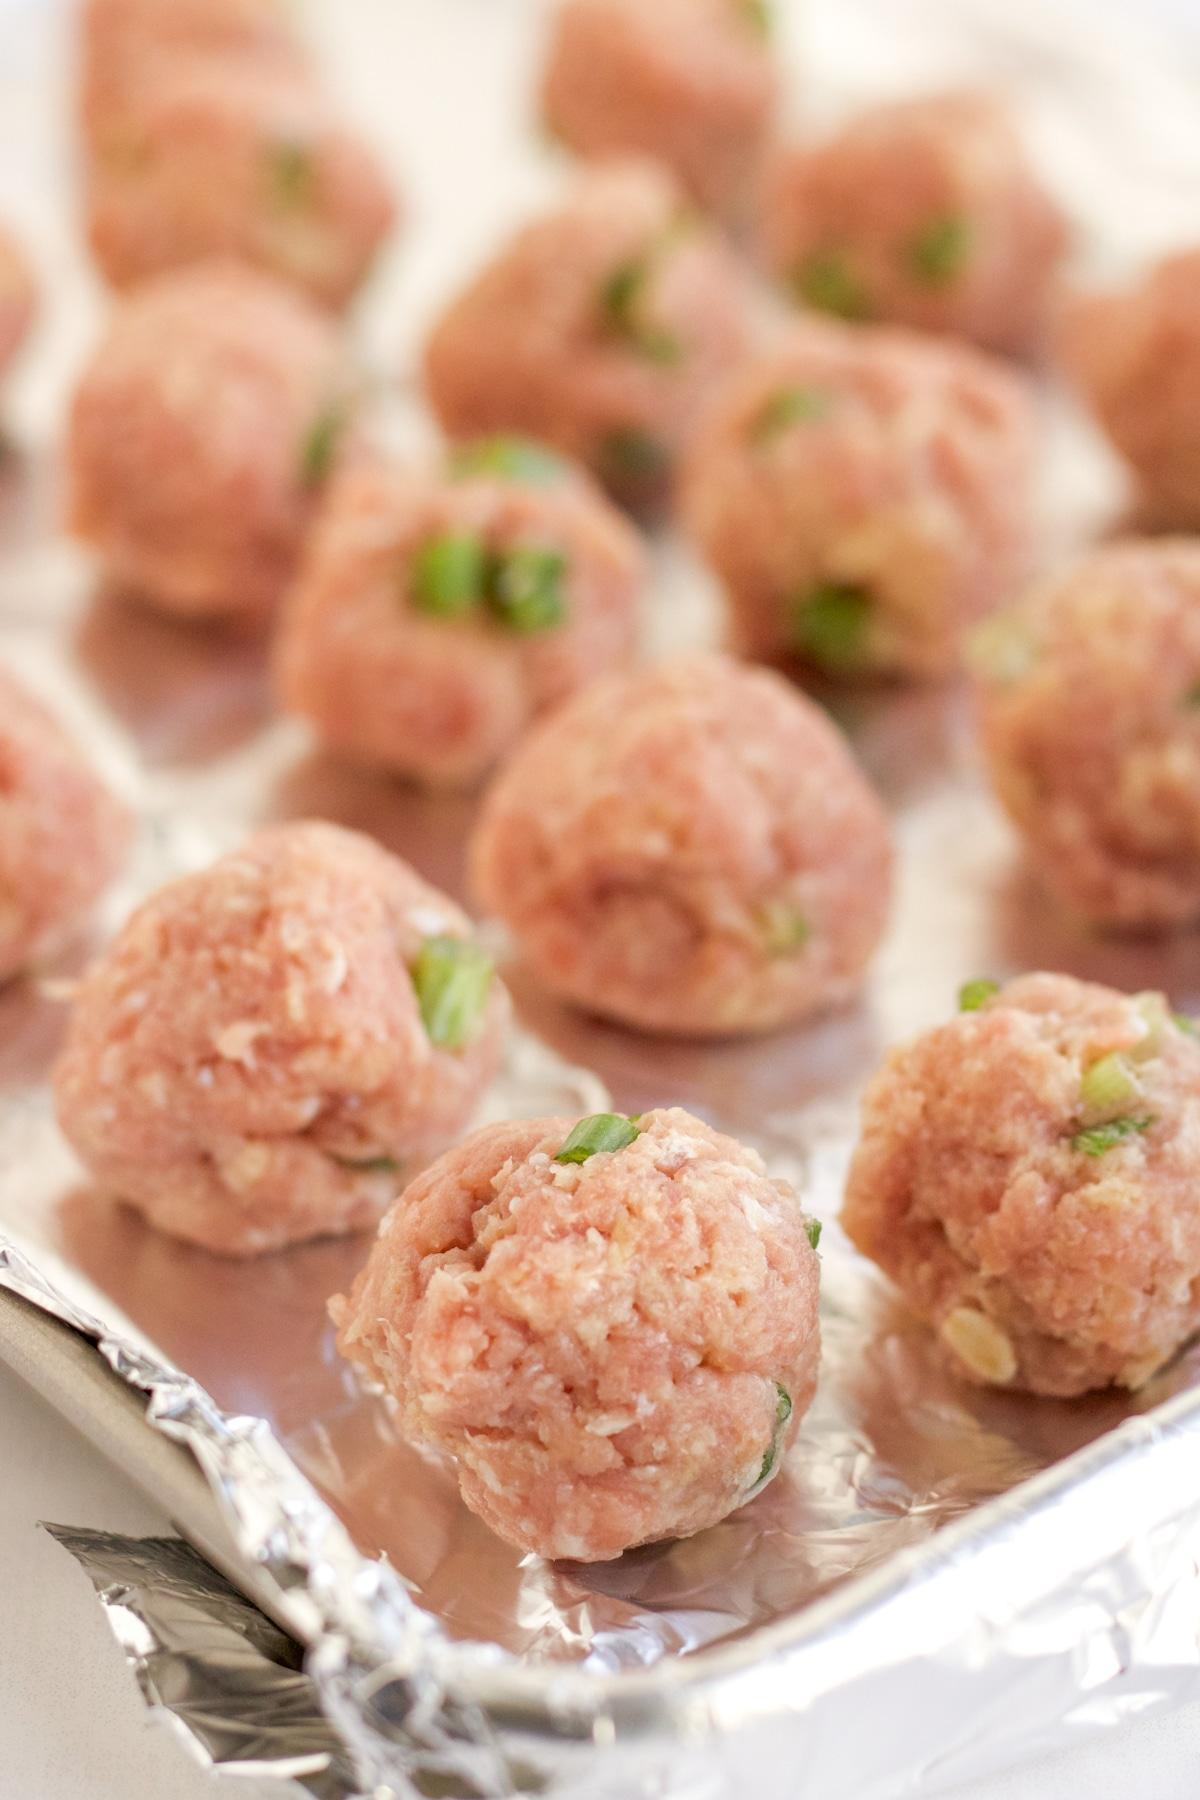 raw meatballs on a foil lined baking sheet